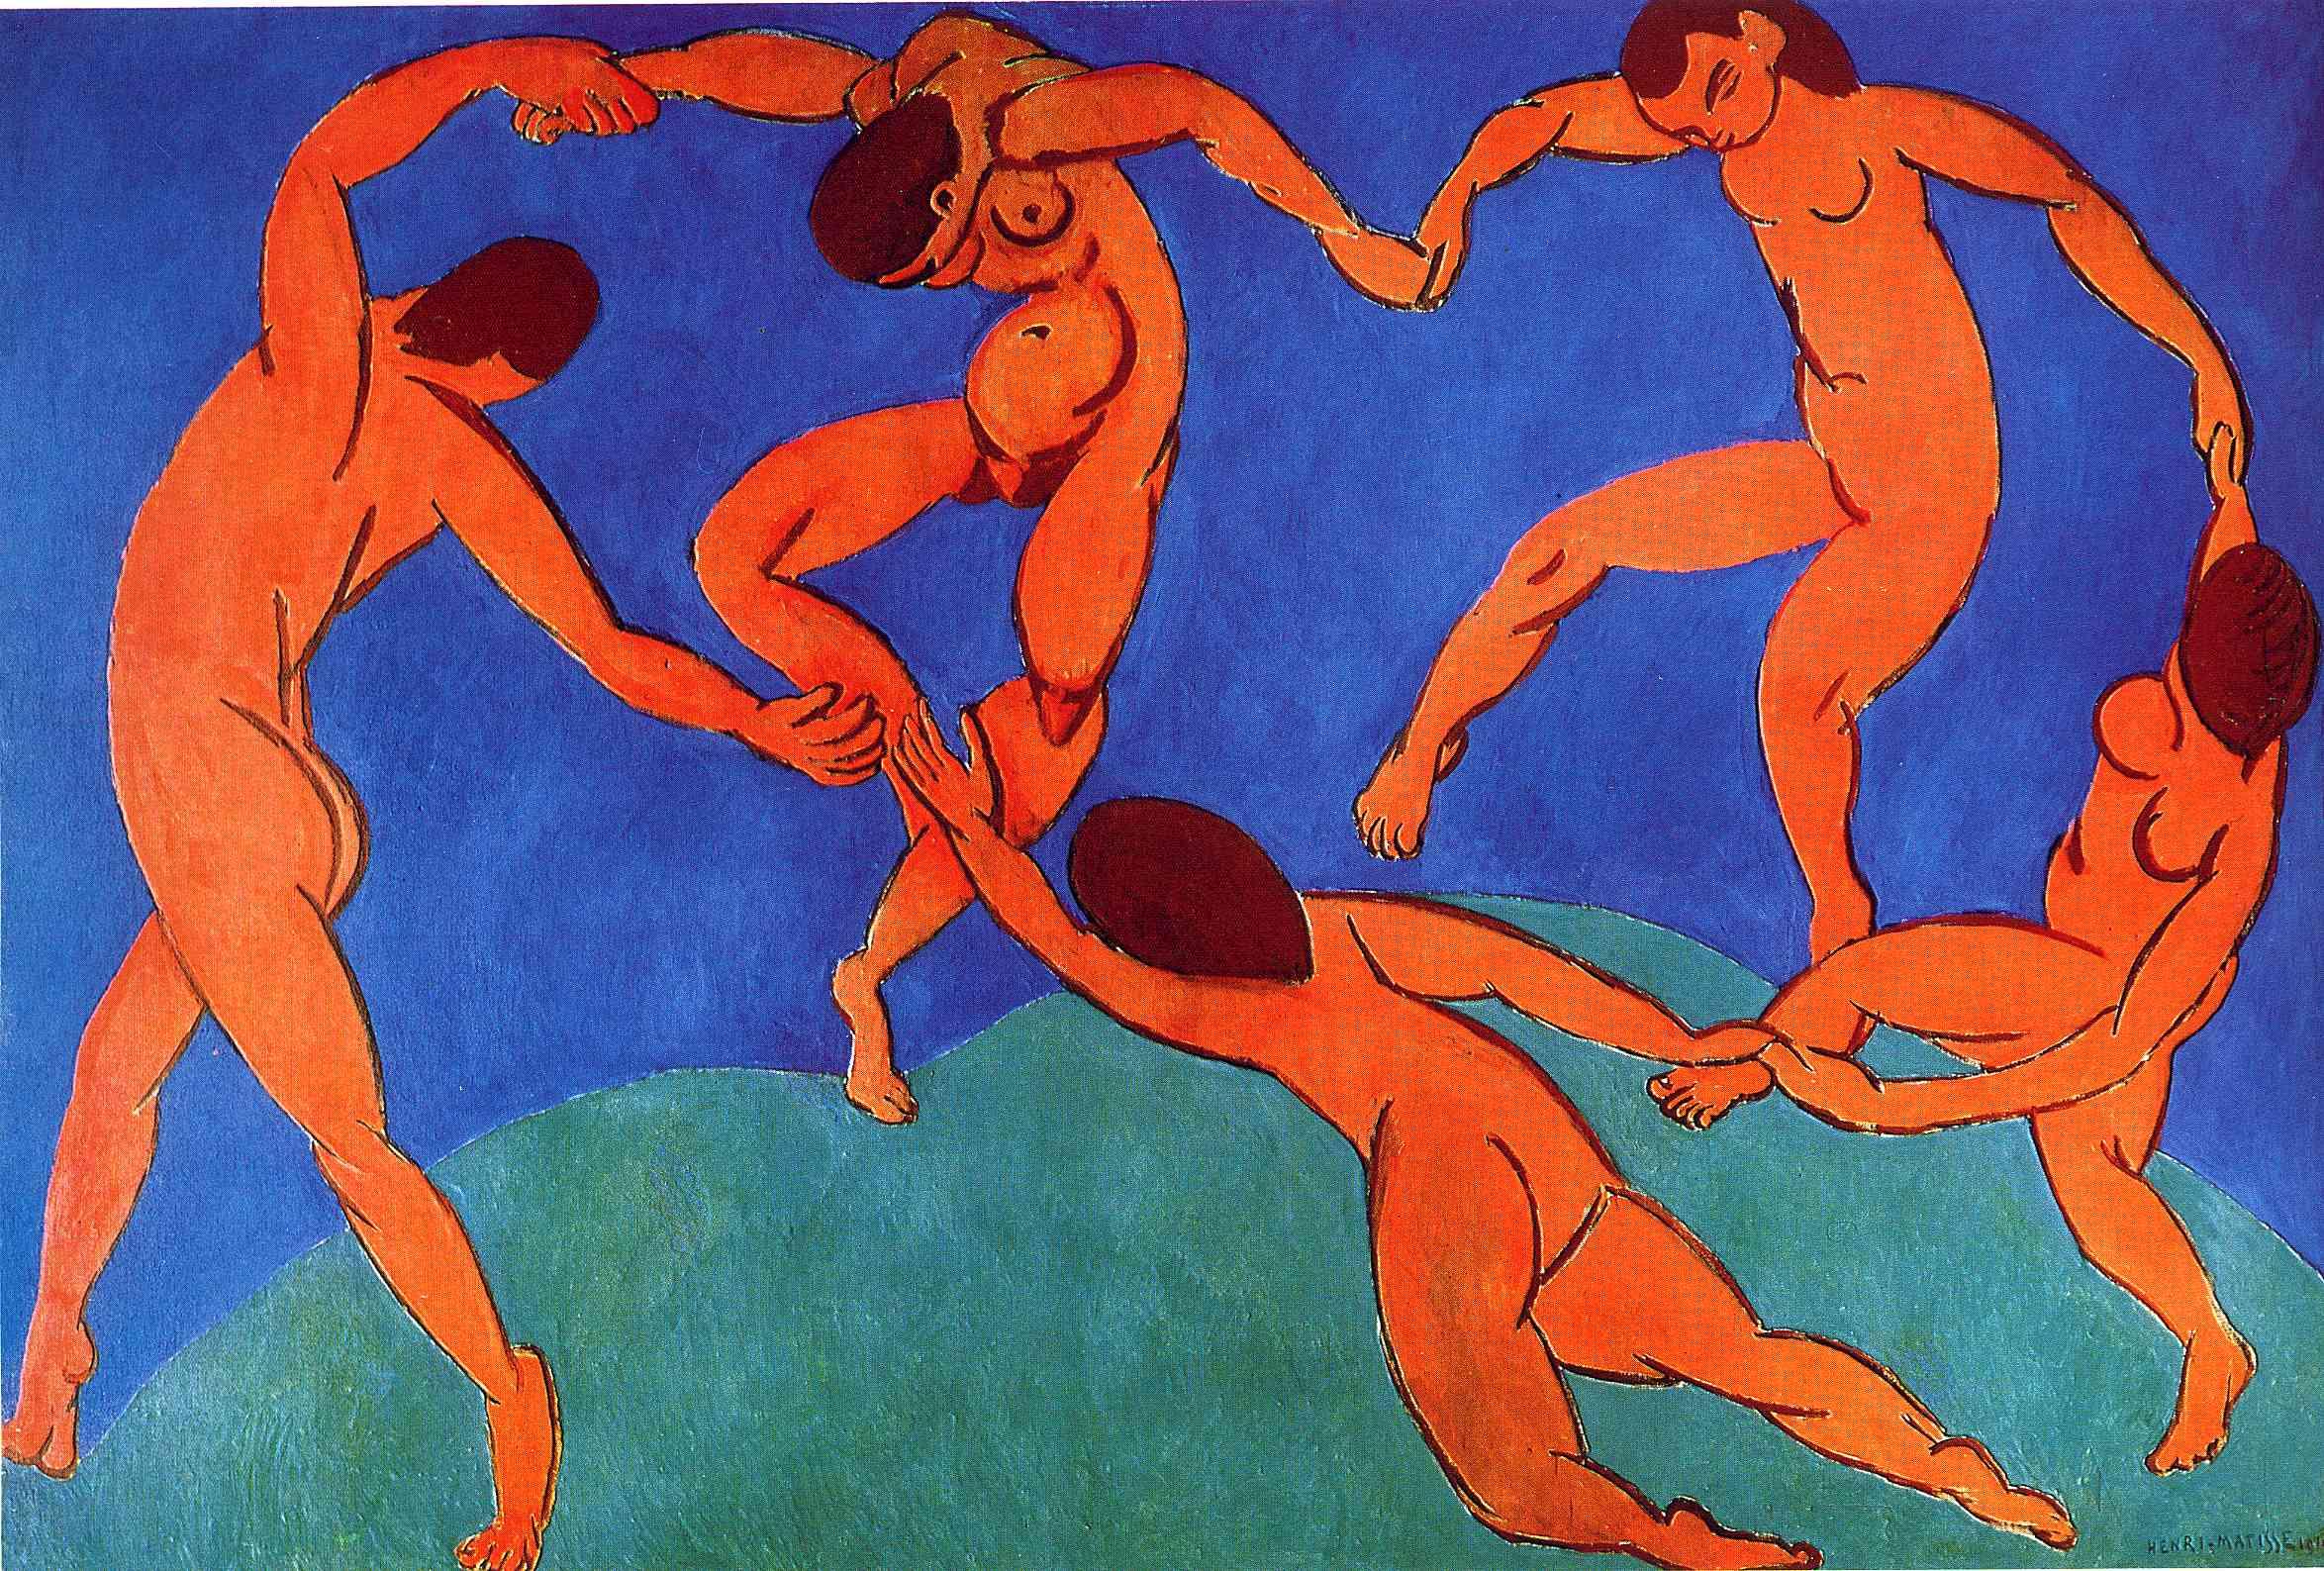 https://uploads6.wikiart.org/images/henri-matisse/dance-ii-1910.jpg